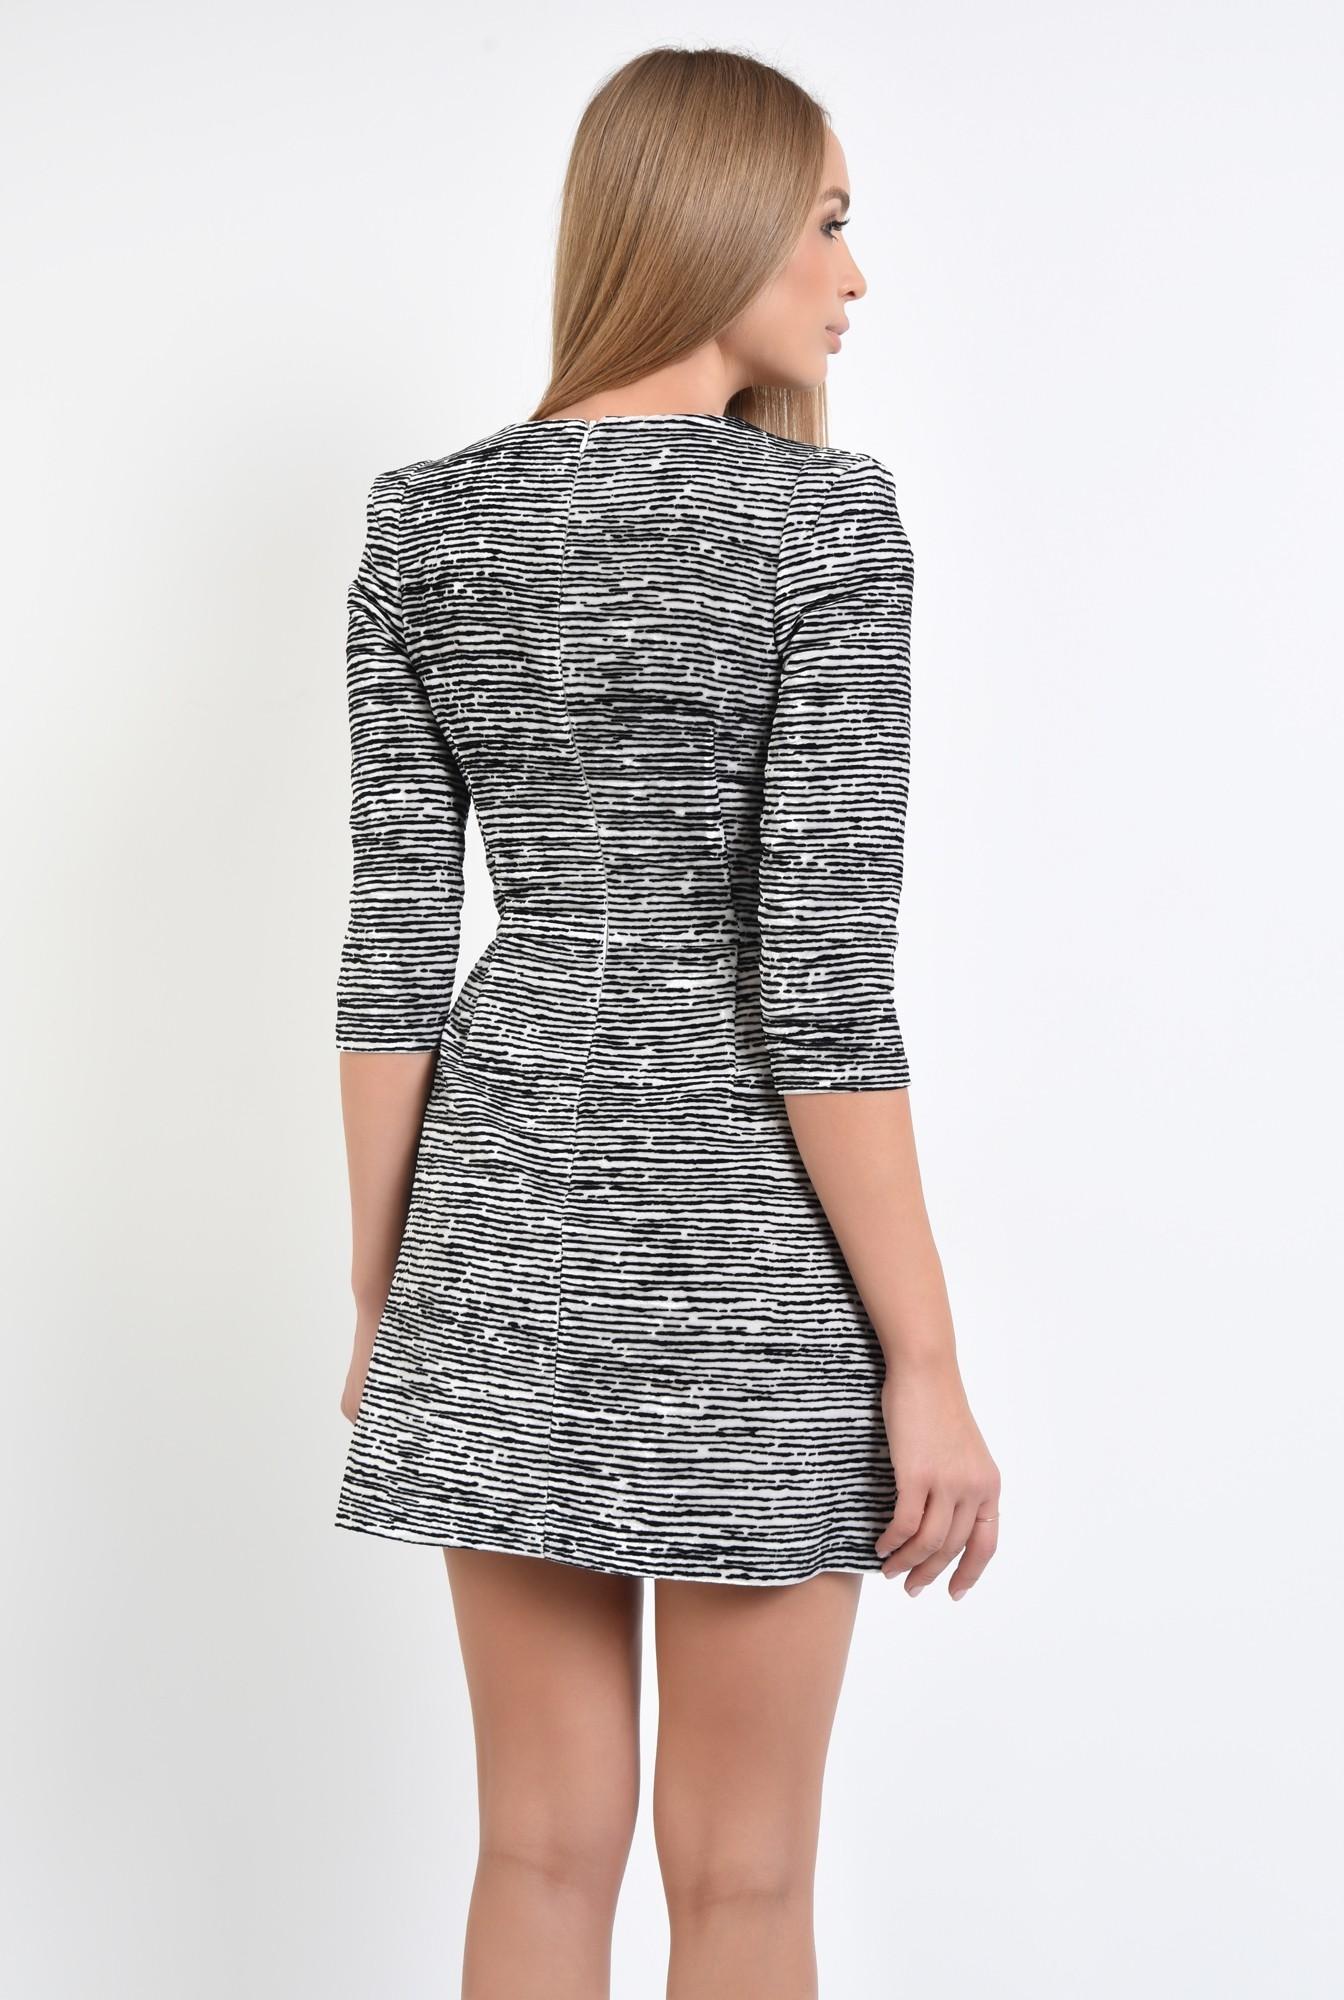 1 - 360 - rochie mini, animal print, zebra, alb-negru